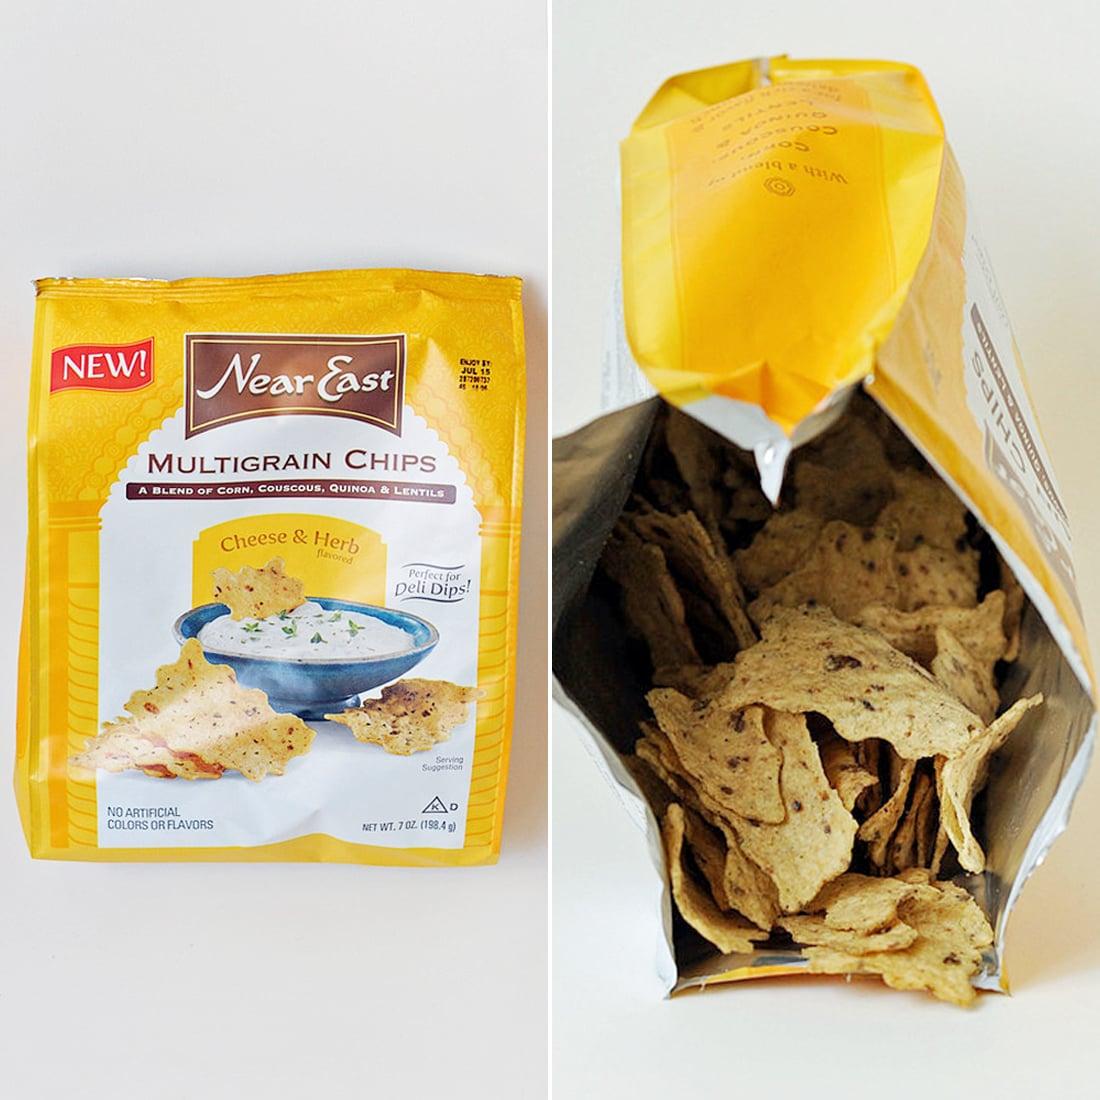 Near East Cheese & Herb Multigrain Chips